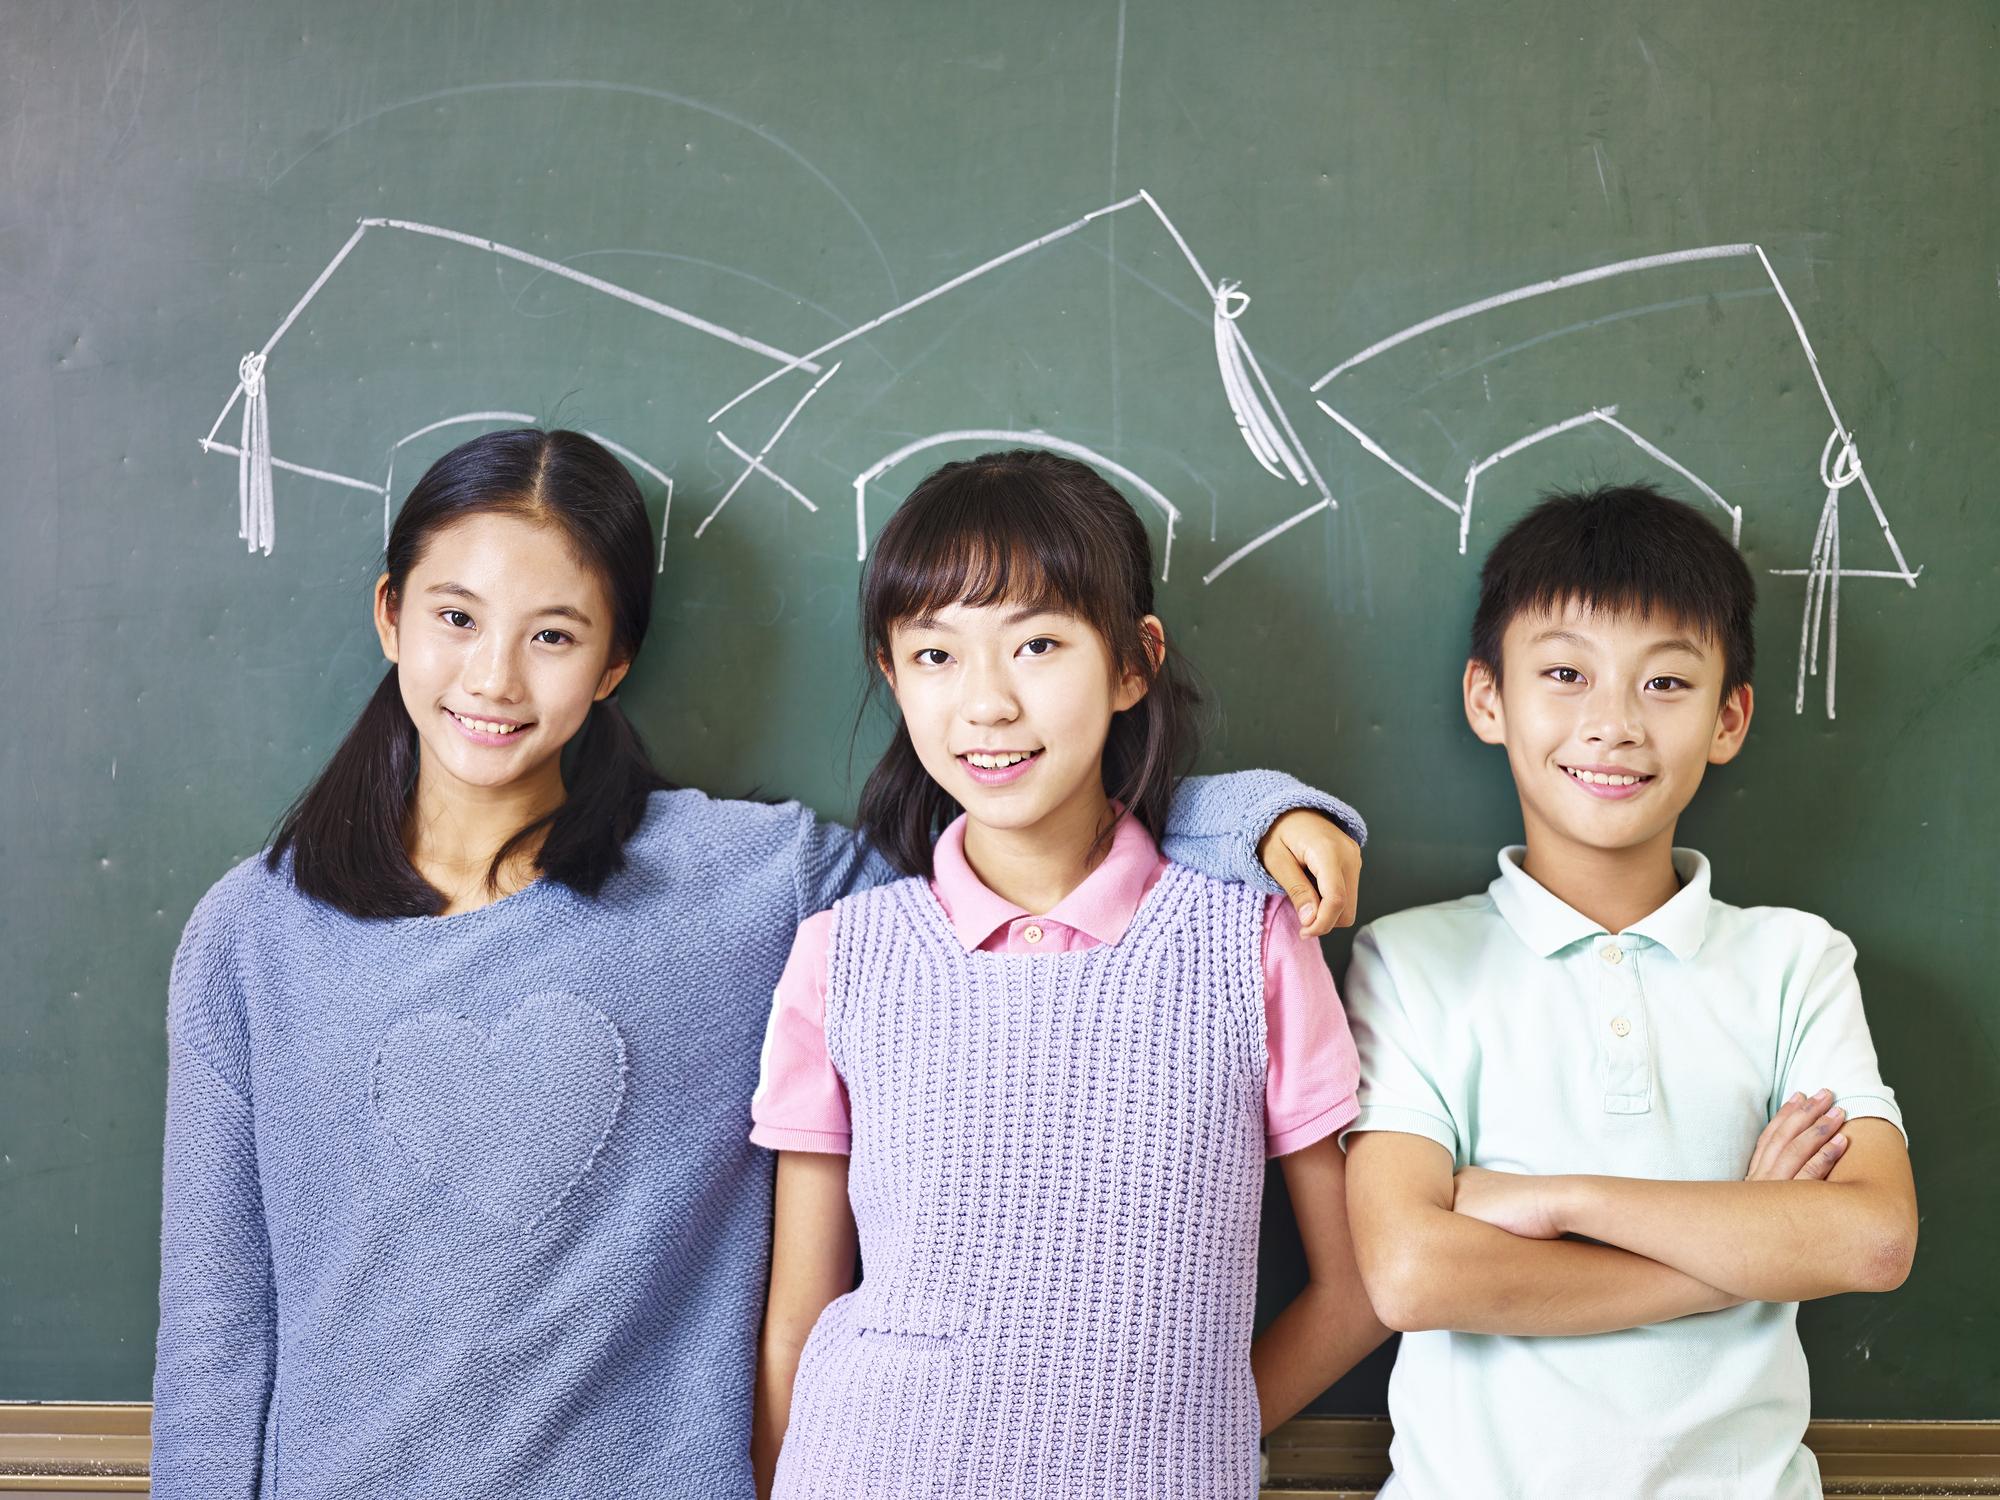 Three Asian elementary school children standing in front of chalkboard underneath chalk-drawn mortarboards